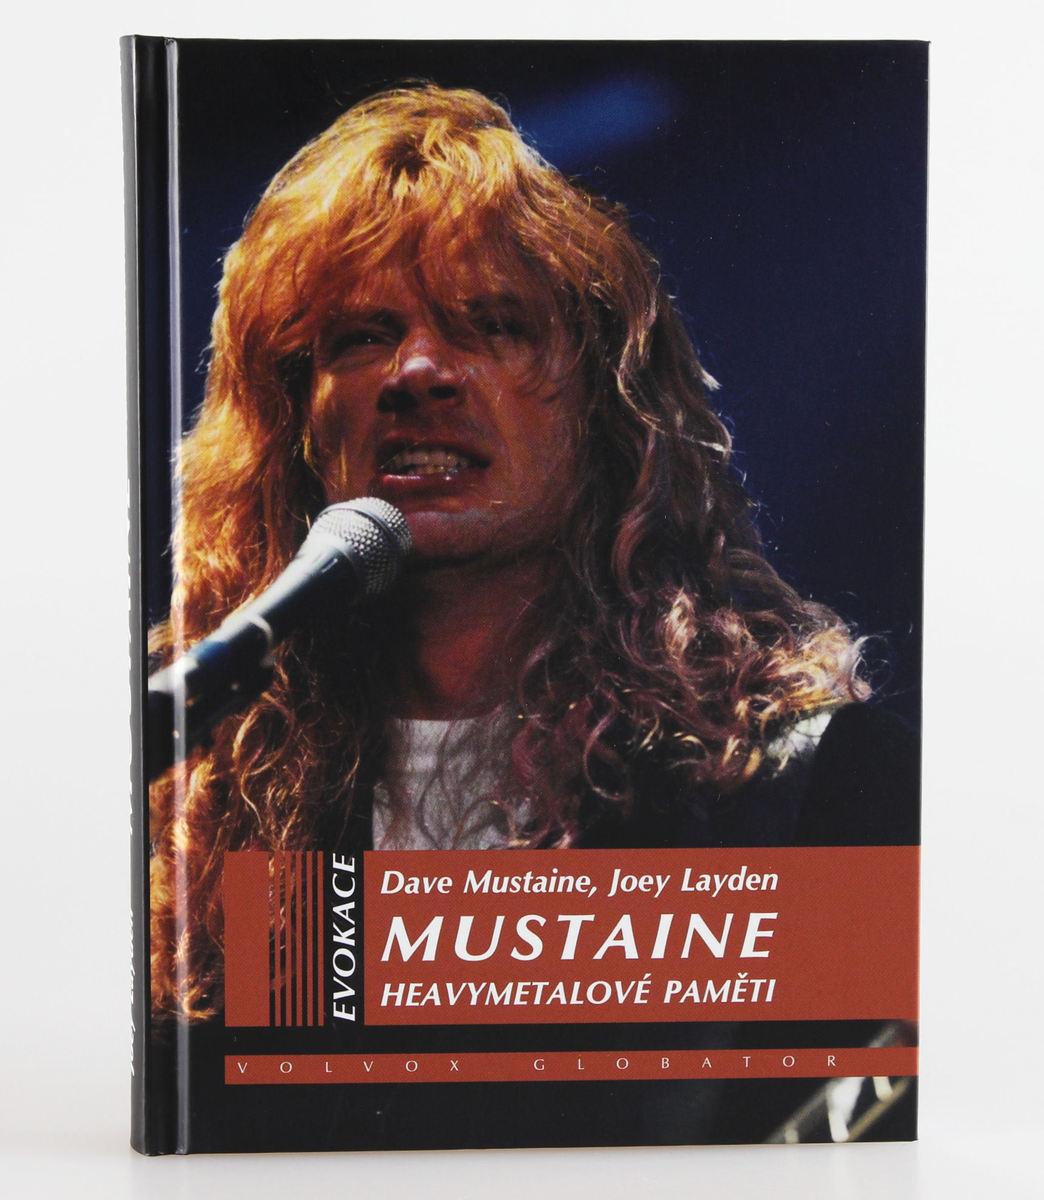 kniha Heavymetalové paměti - Dave Mustaine, Joey Layden - VOL026